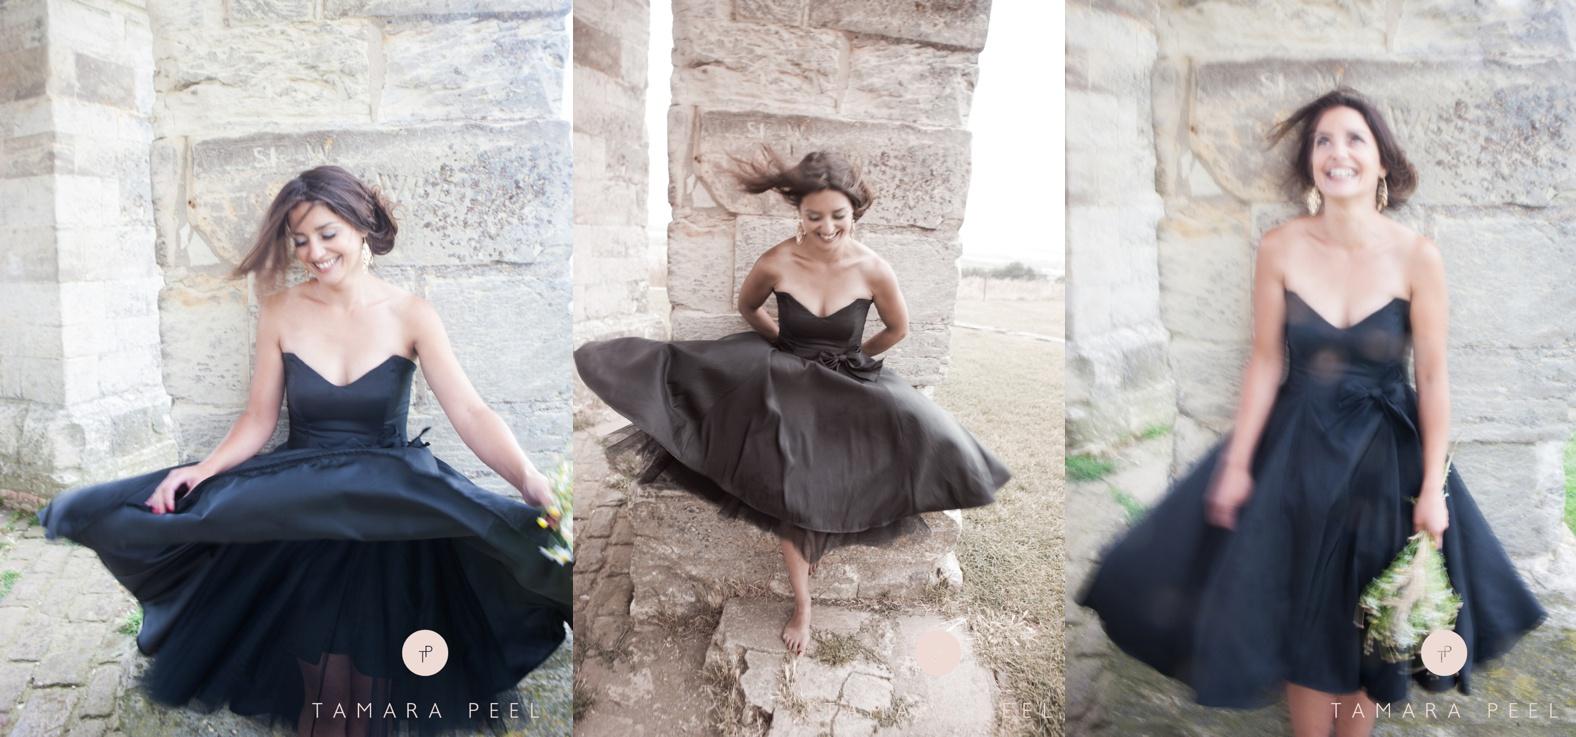 Tamara Peel. V,Macken,photographer,female_0164